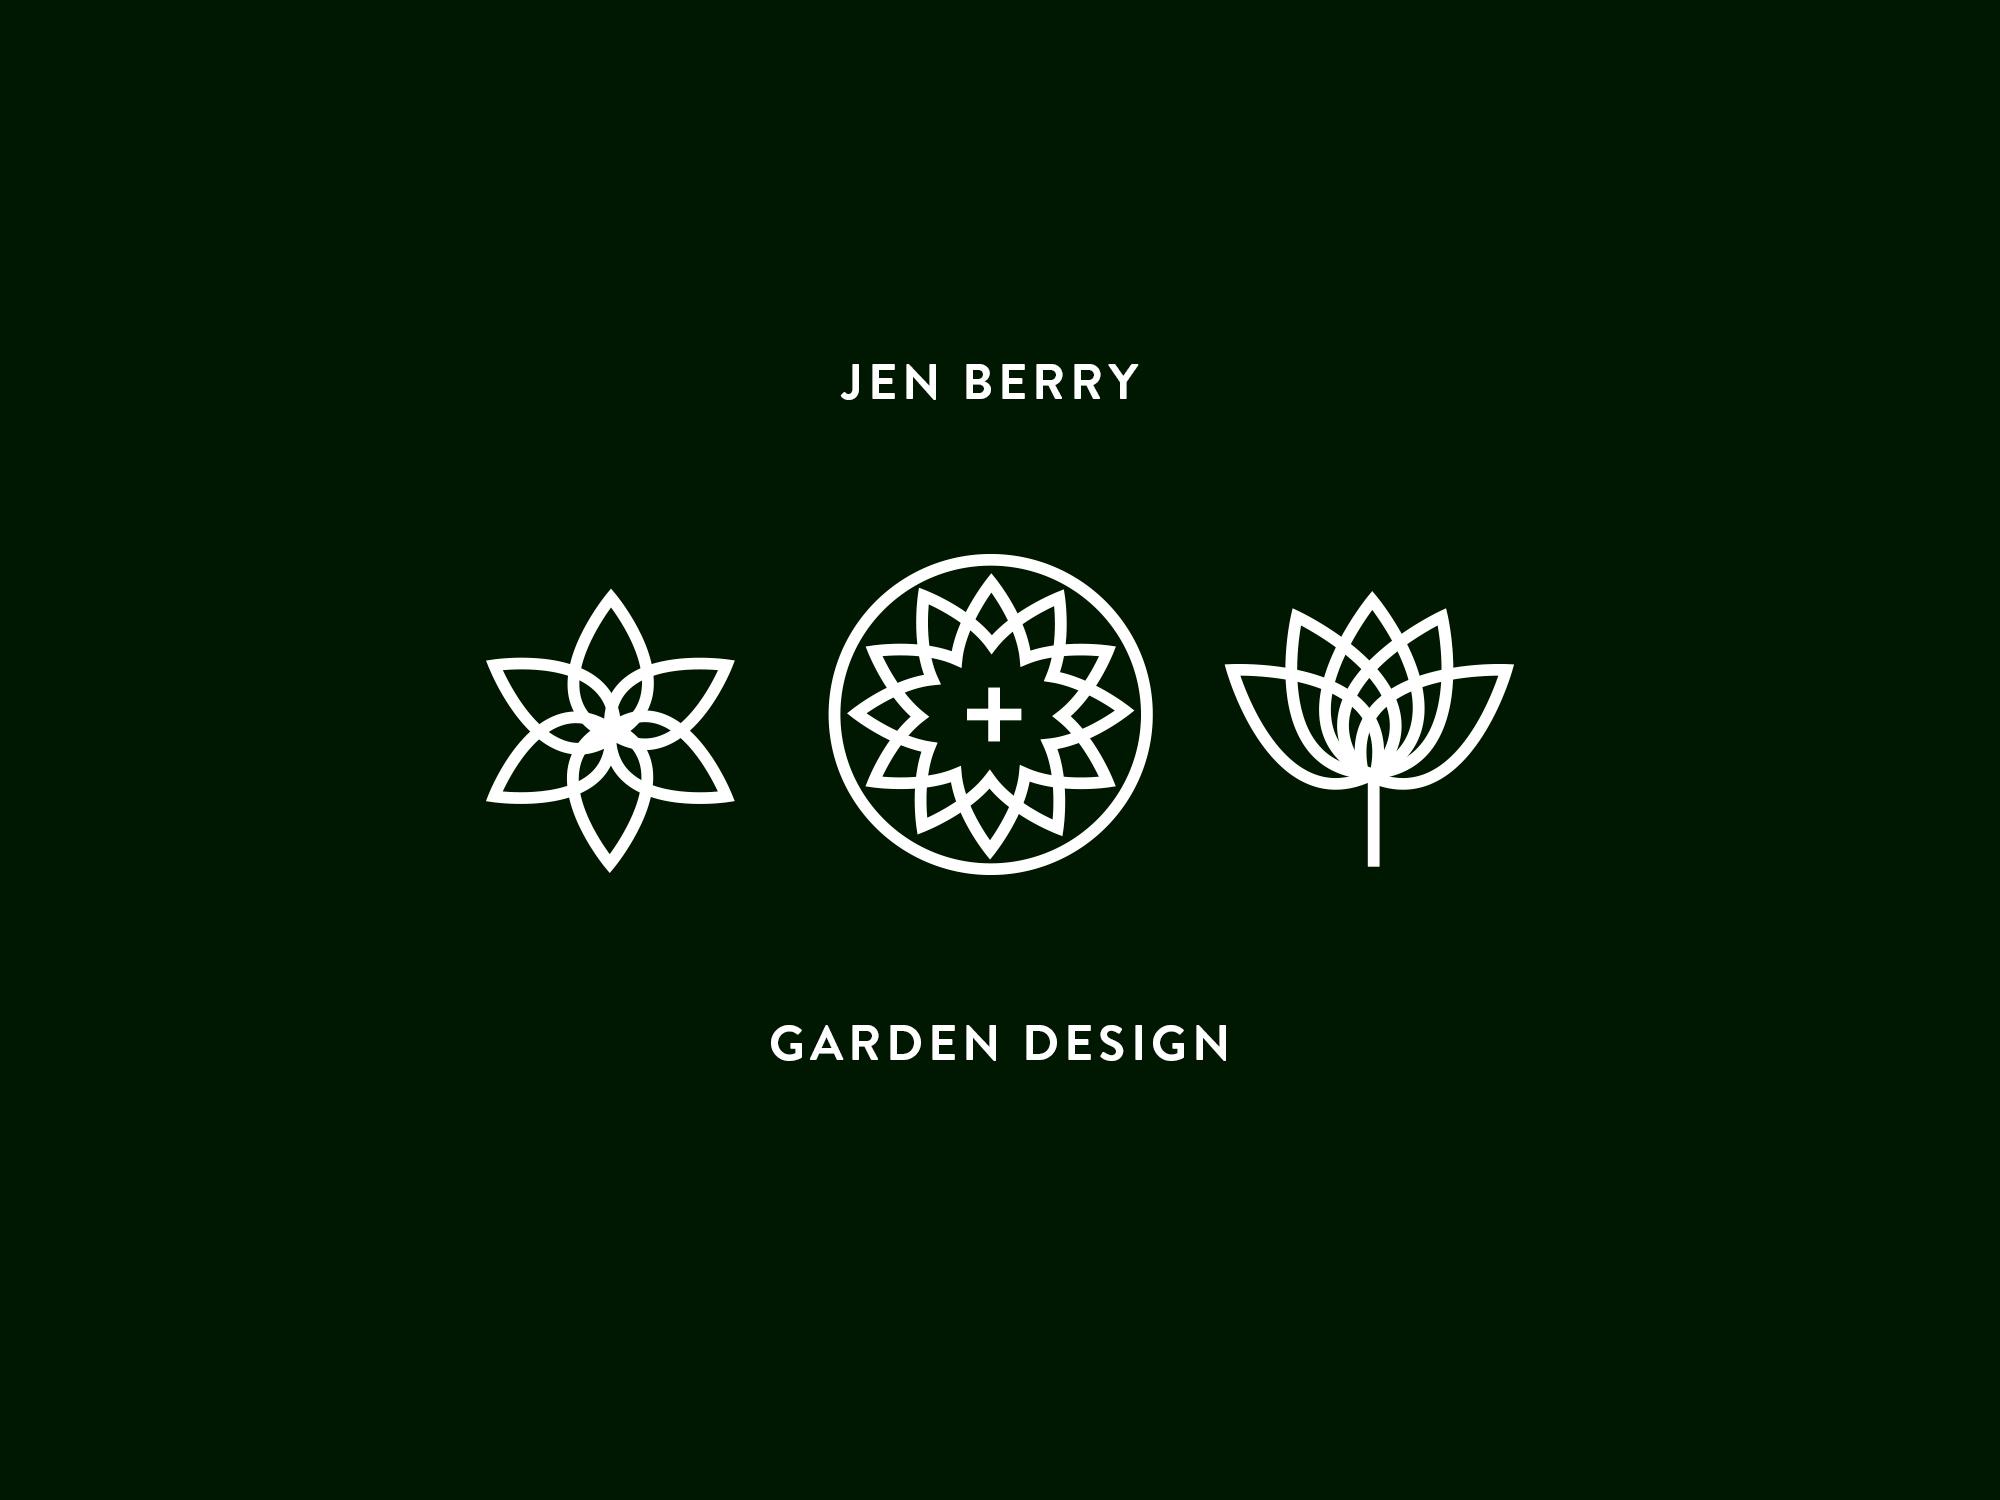 jenberry_1.jpg